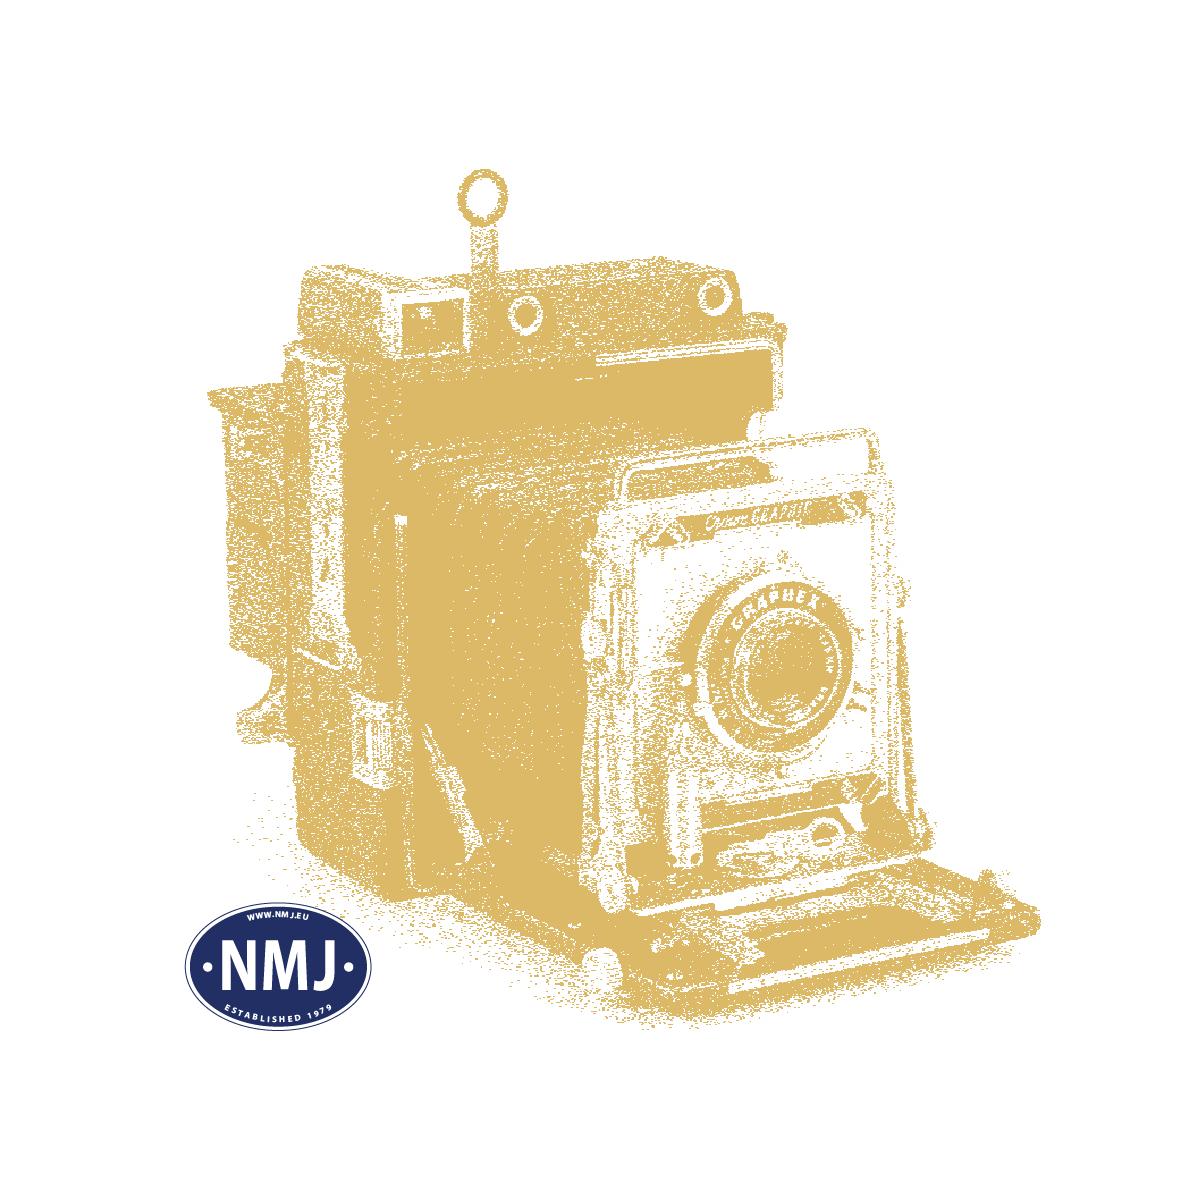 NMJT90210 - NMJ Topline MAV M61.013, DC